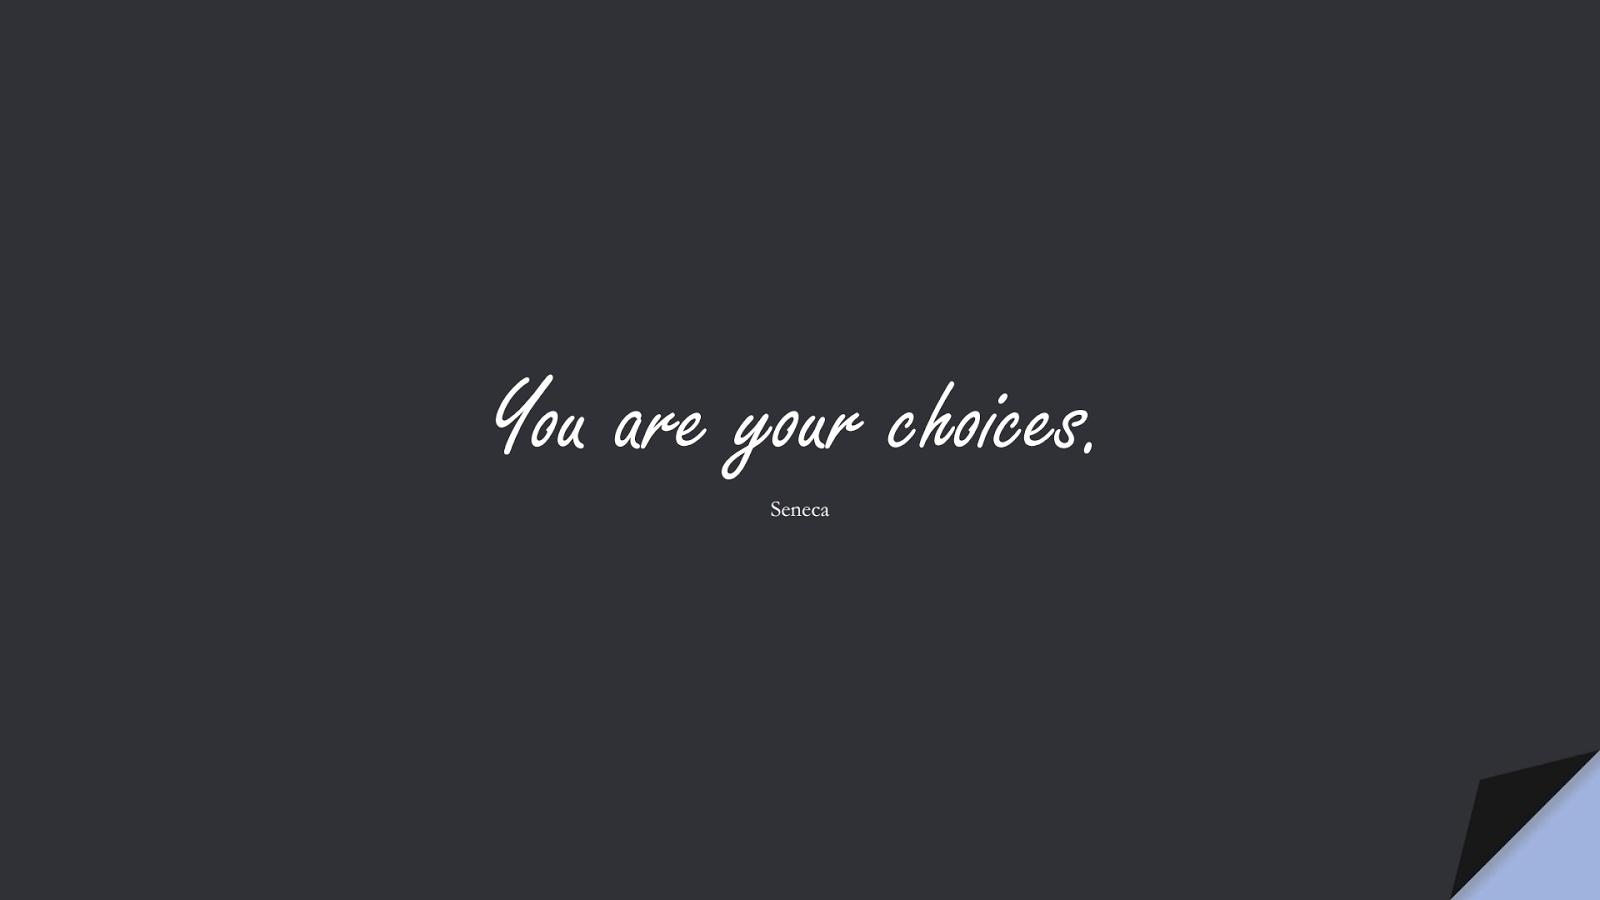 You are your choices. (Seneca);  #ShortQuotes